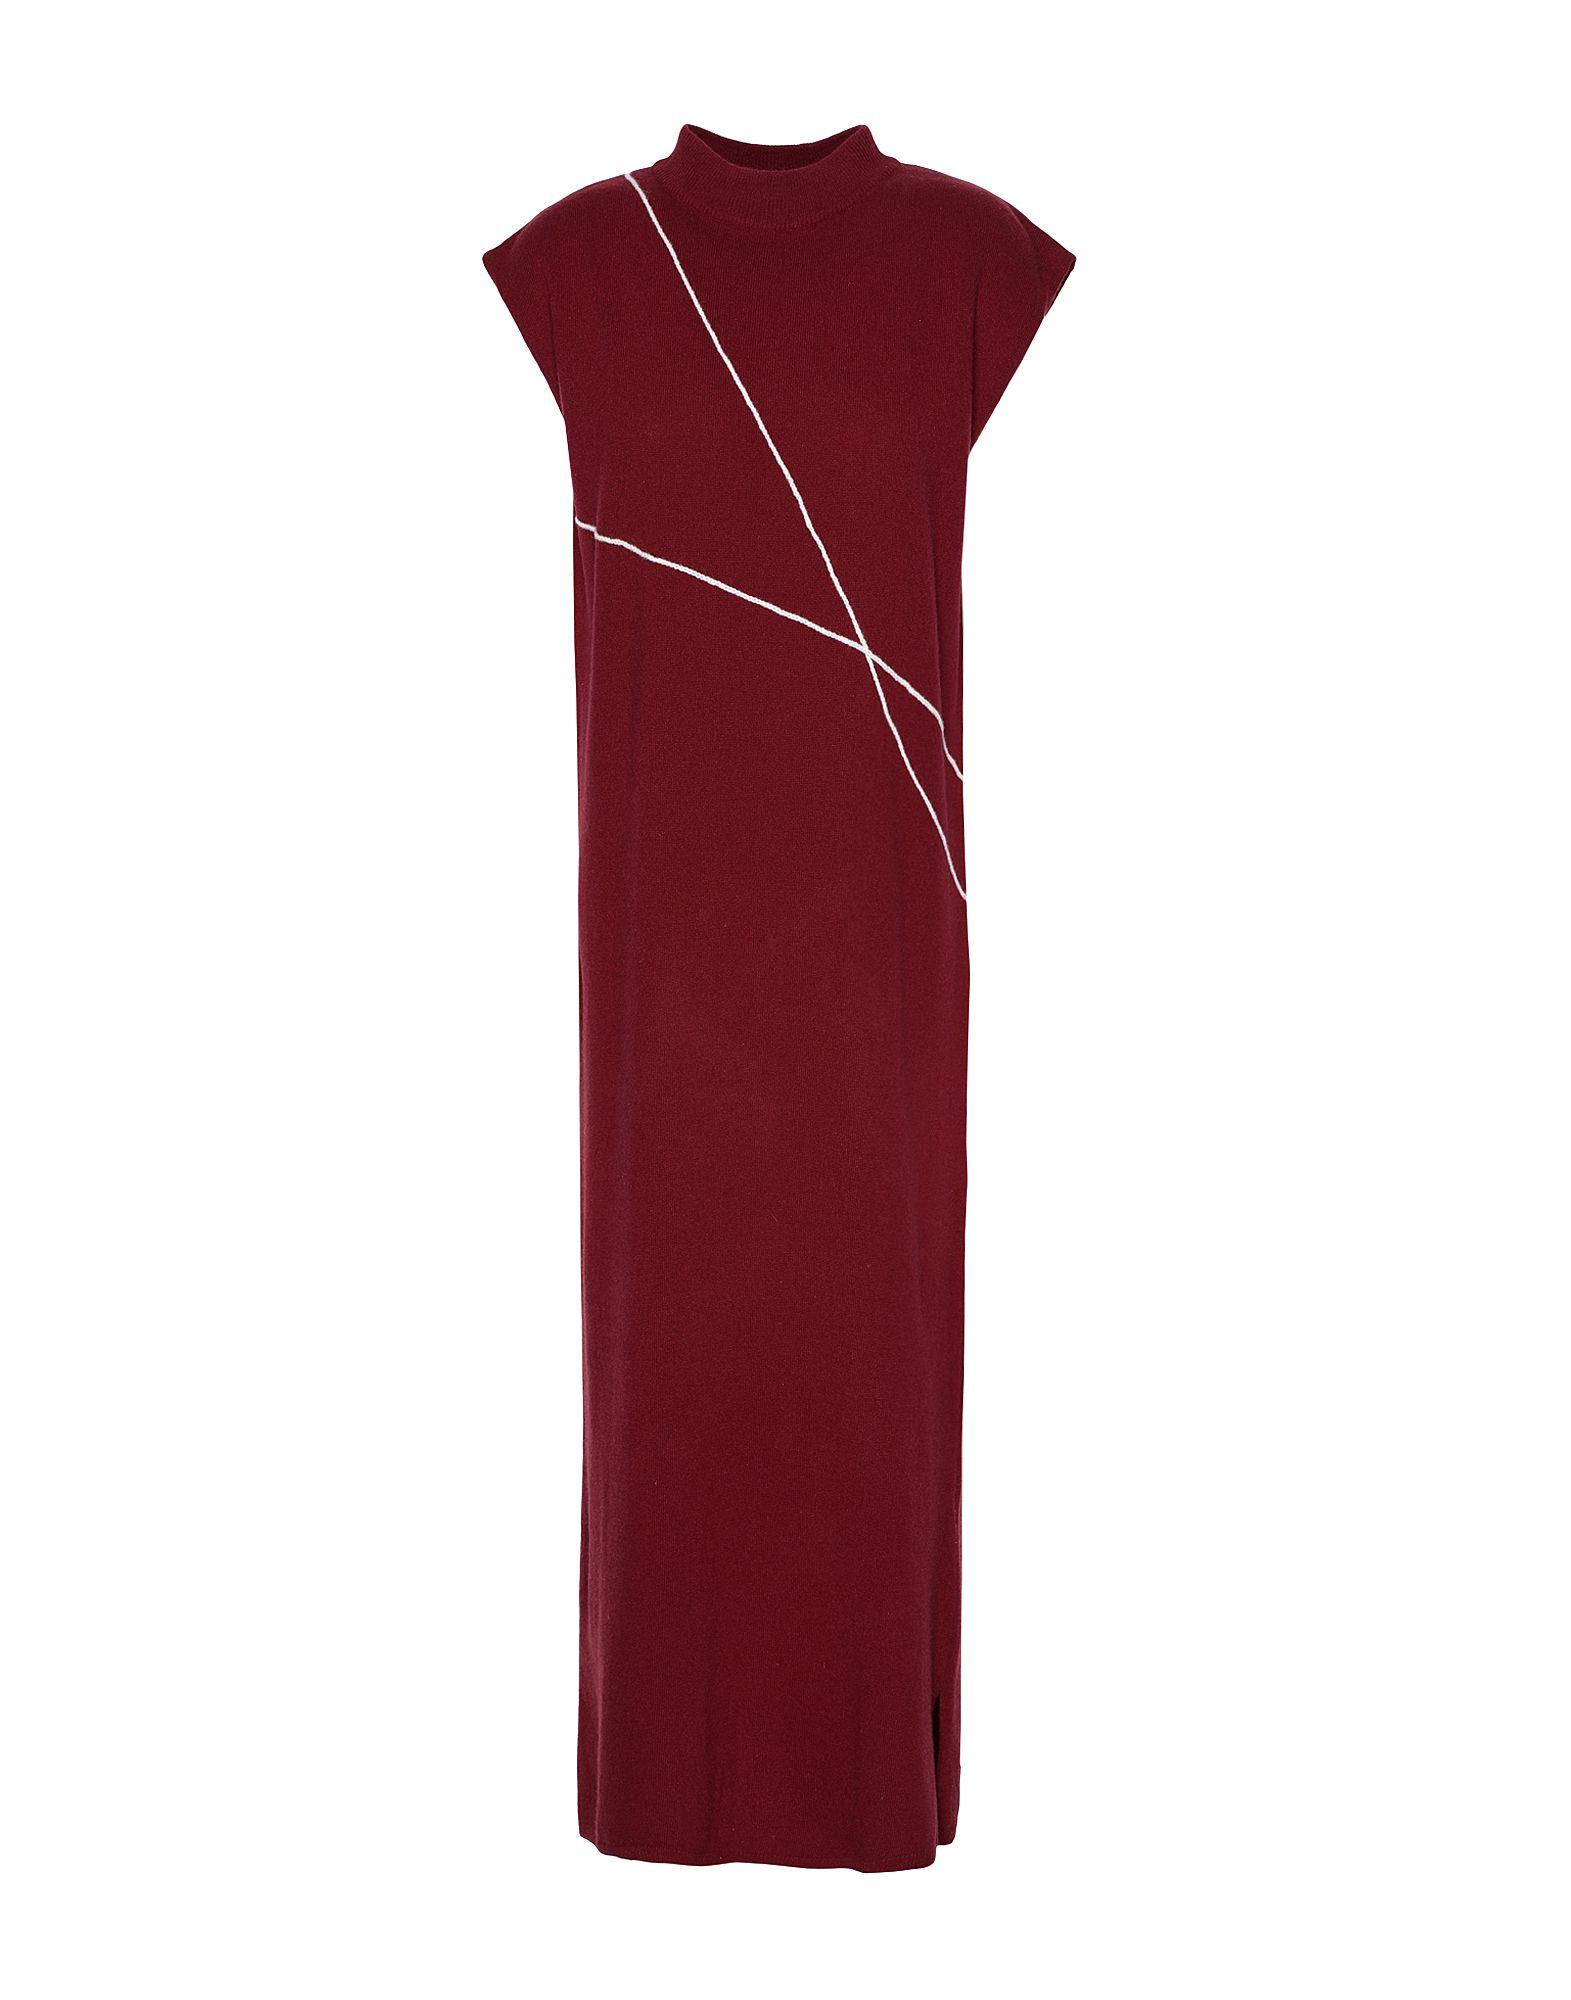 8 by YOOX Платье длиной 3/4 платье miss blumarine платья миди до колен